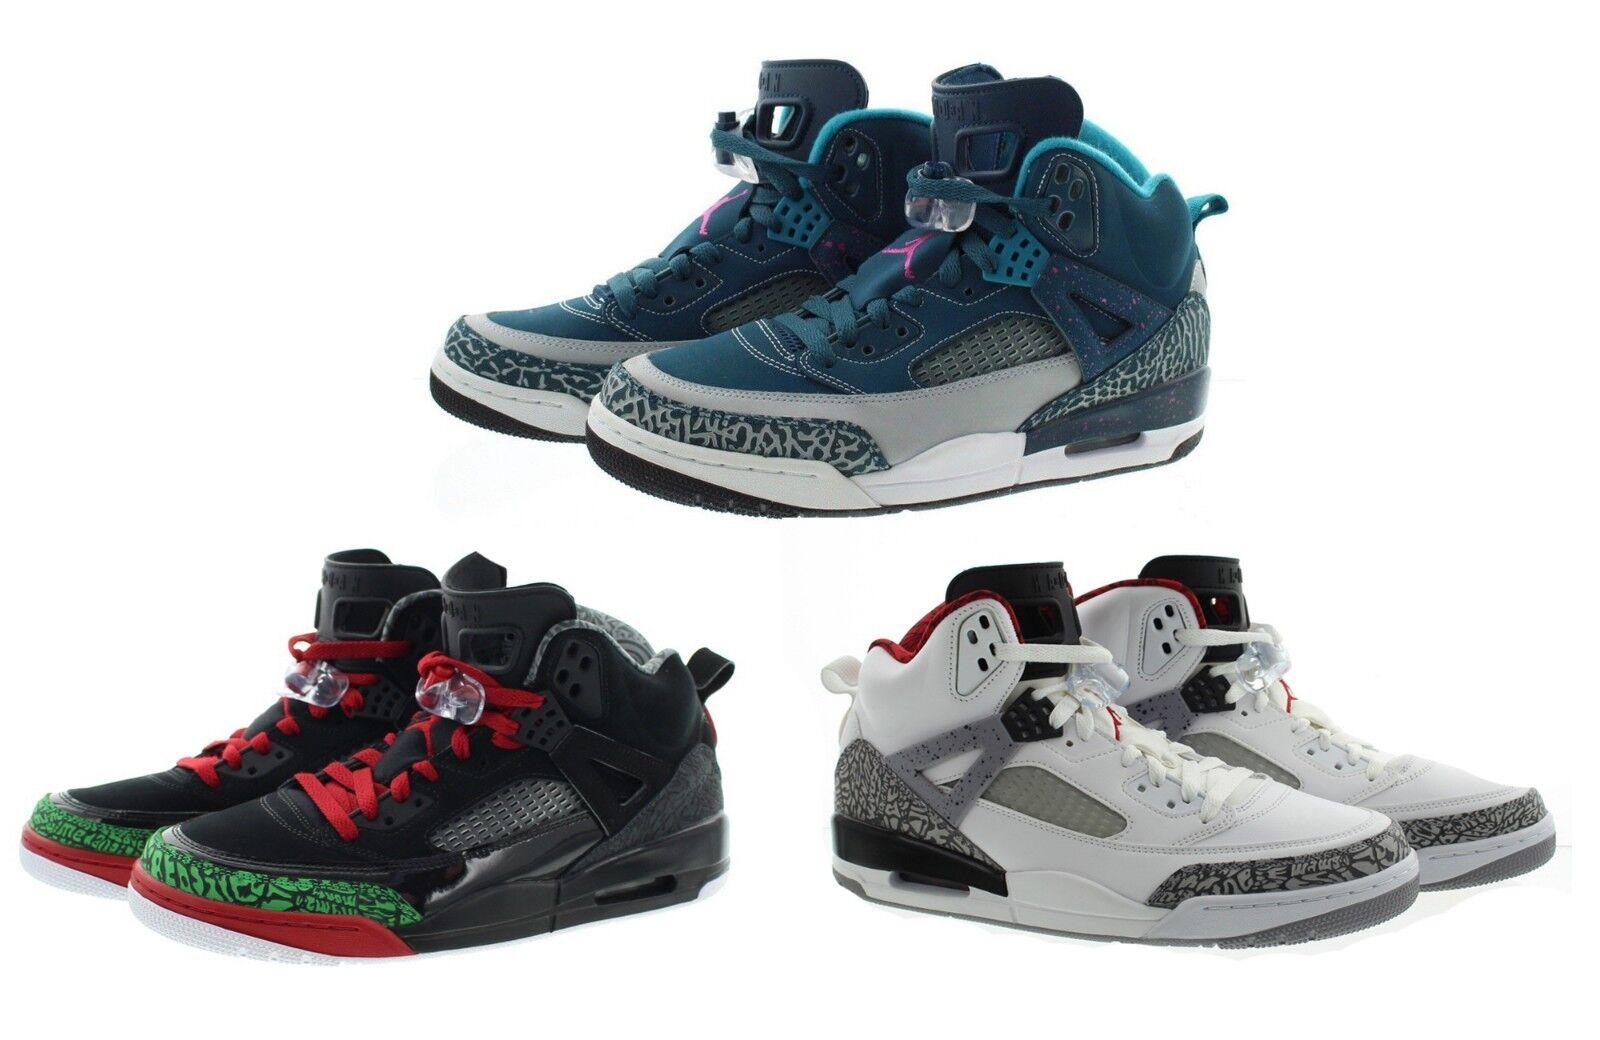 Nike 315371 Mens Air Jordan Spizike Off Court Mid Top Basketball Shoes Sneakers